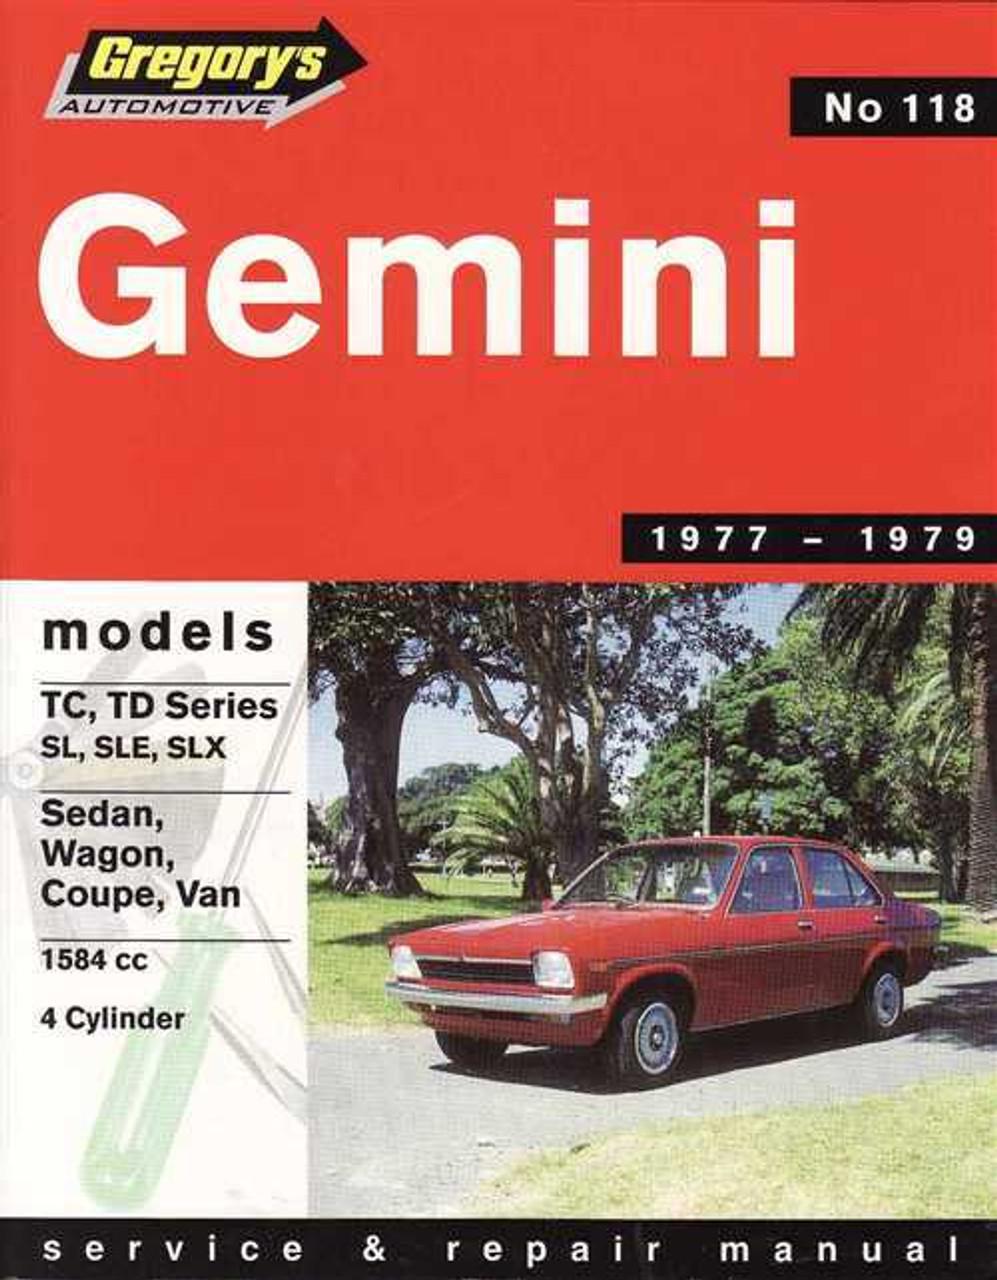 holden gemini workshop manual pdf